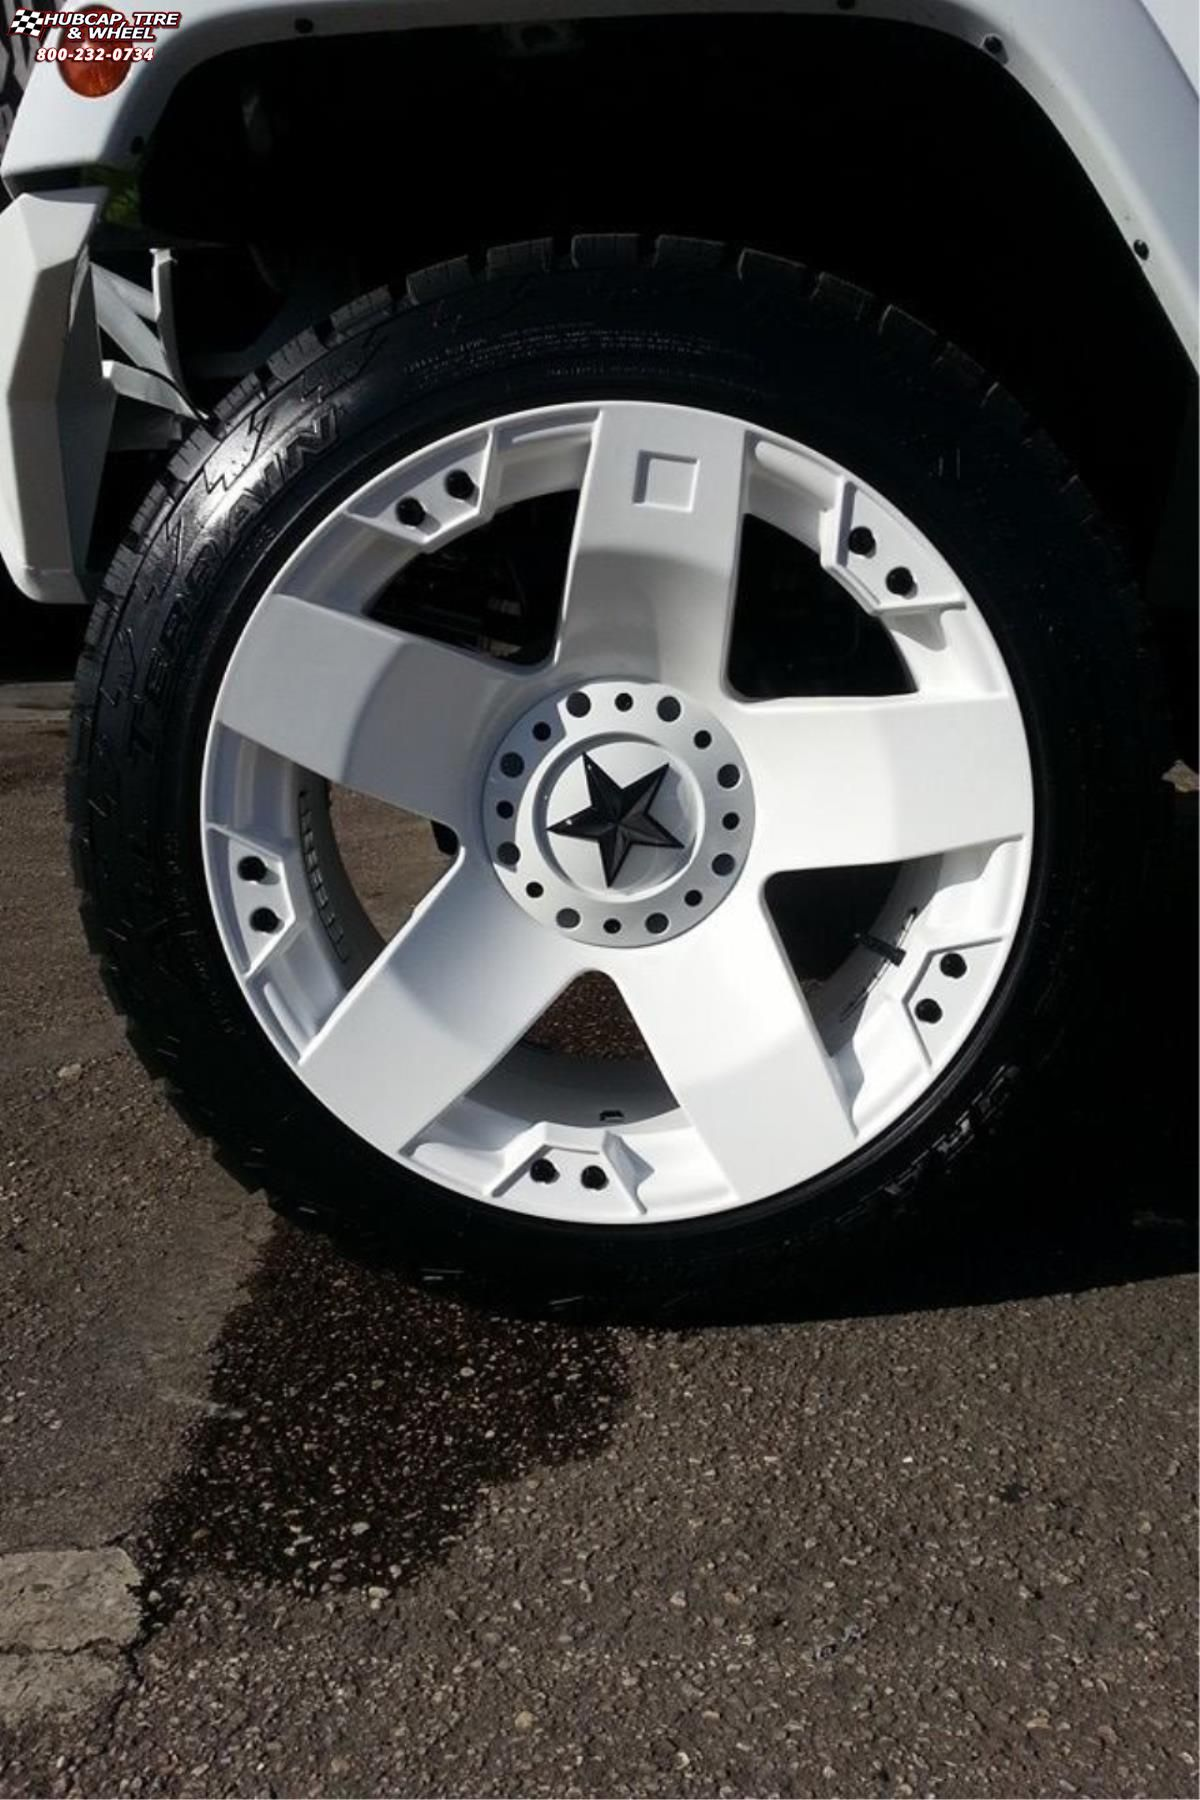 Jeep Wrangler Xd Series Xd775 Rockstar X White Wheels And Rims